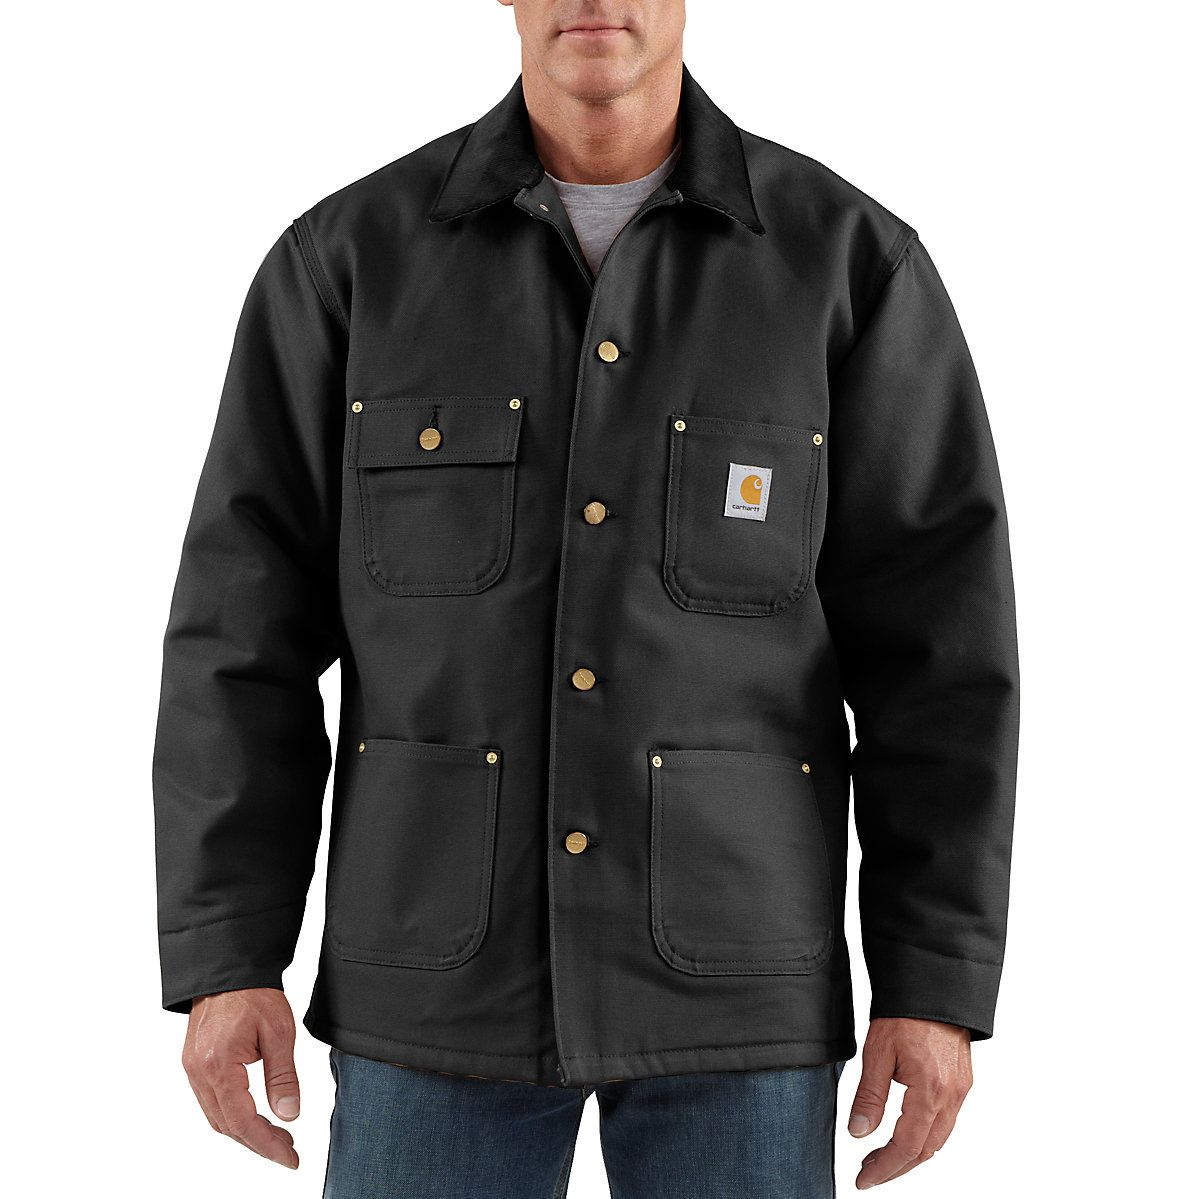 Men 39 S Water Repellent And Wind Resistant 12 Oz Firm Hand Duck Carhartt 39 S Most Iconic Style Chore Coat Carhartt Jacket Chore Coat Men [ 1199 x 1200 Pixel ]